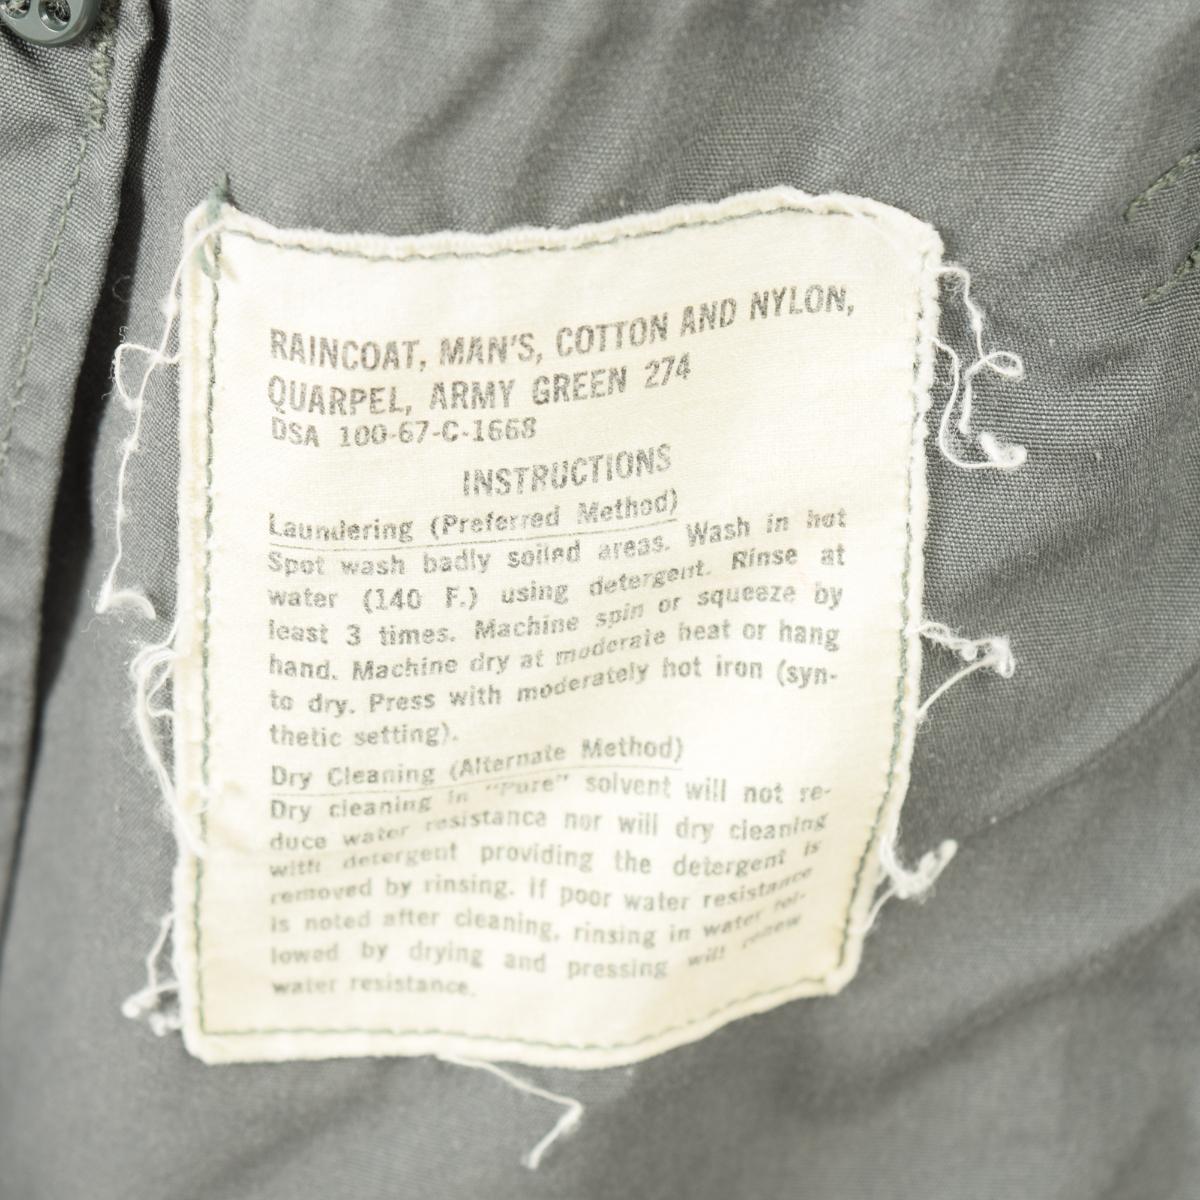 1982 field military jacket coat og-107 olive drab x-small short.